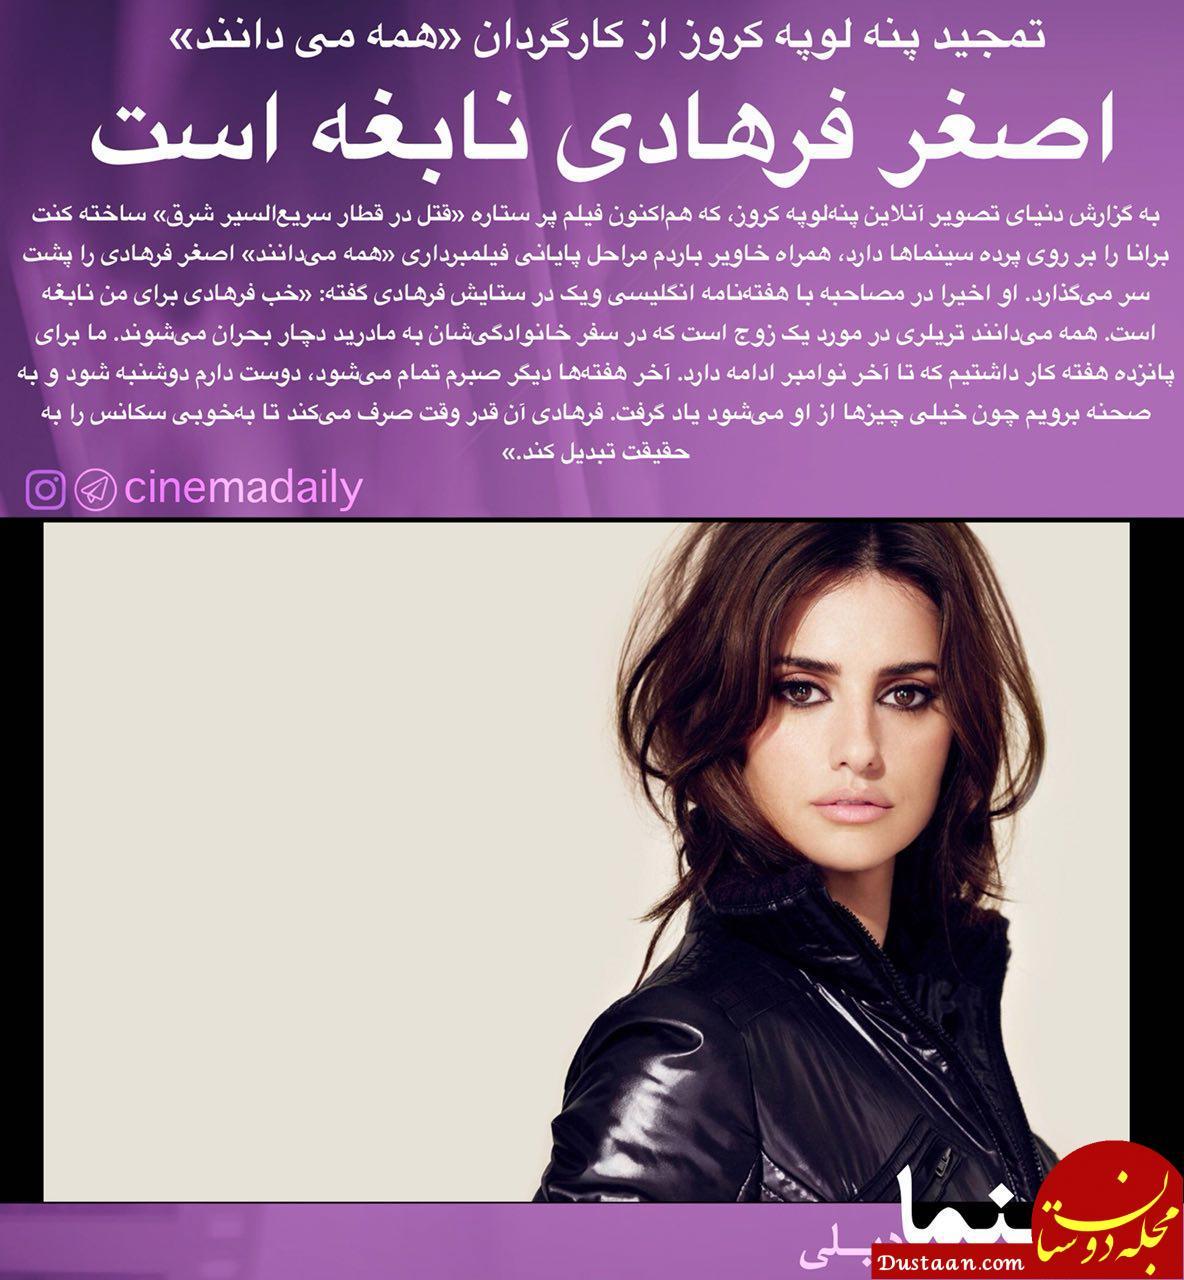 www.dustaan.com تعریف و تمجید پنه لوپه کروز از اصغر فرهادی /او یک نابغه است! +عکس